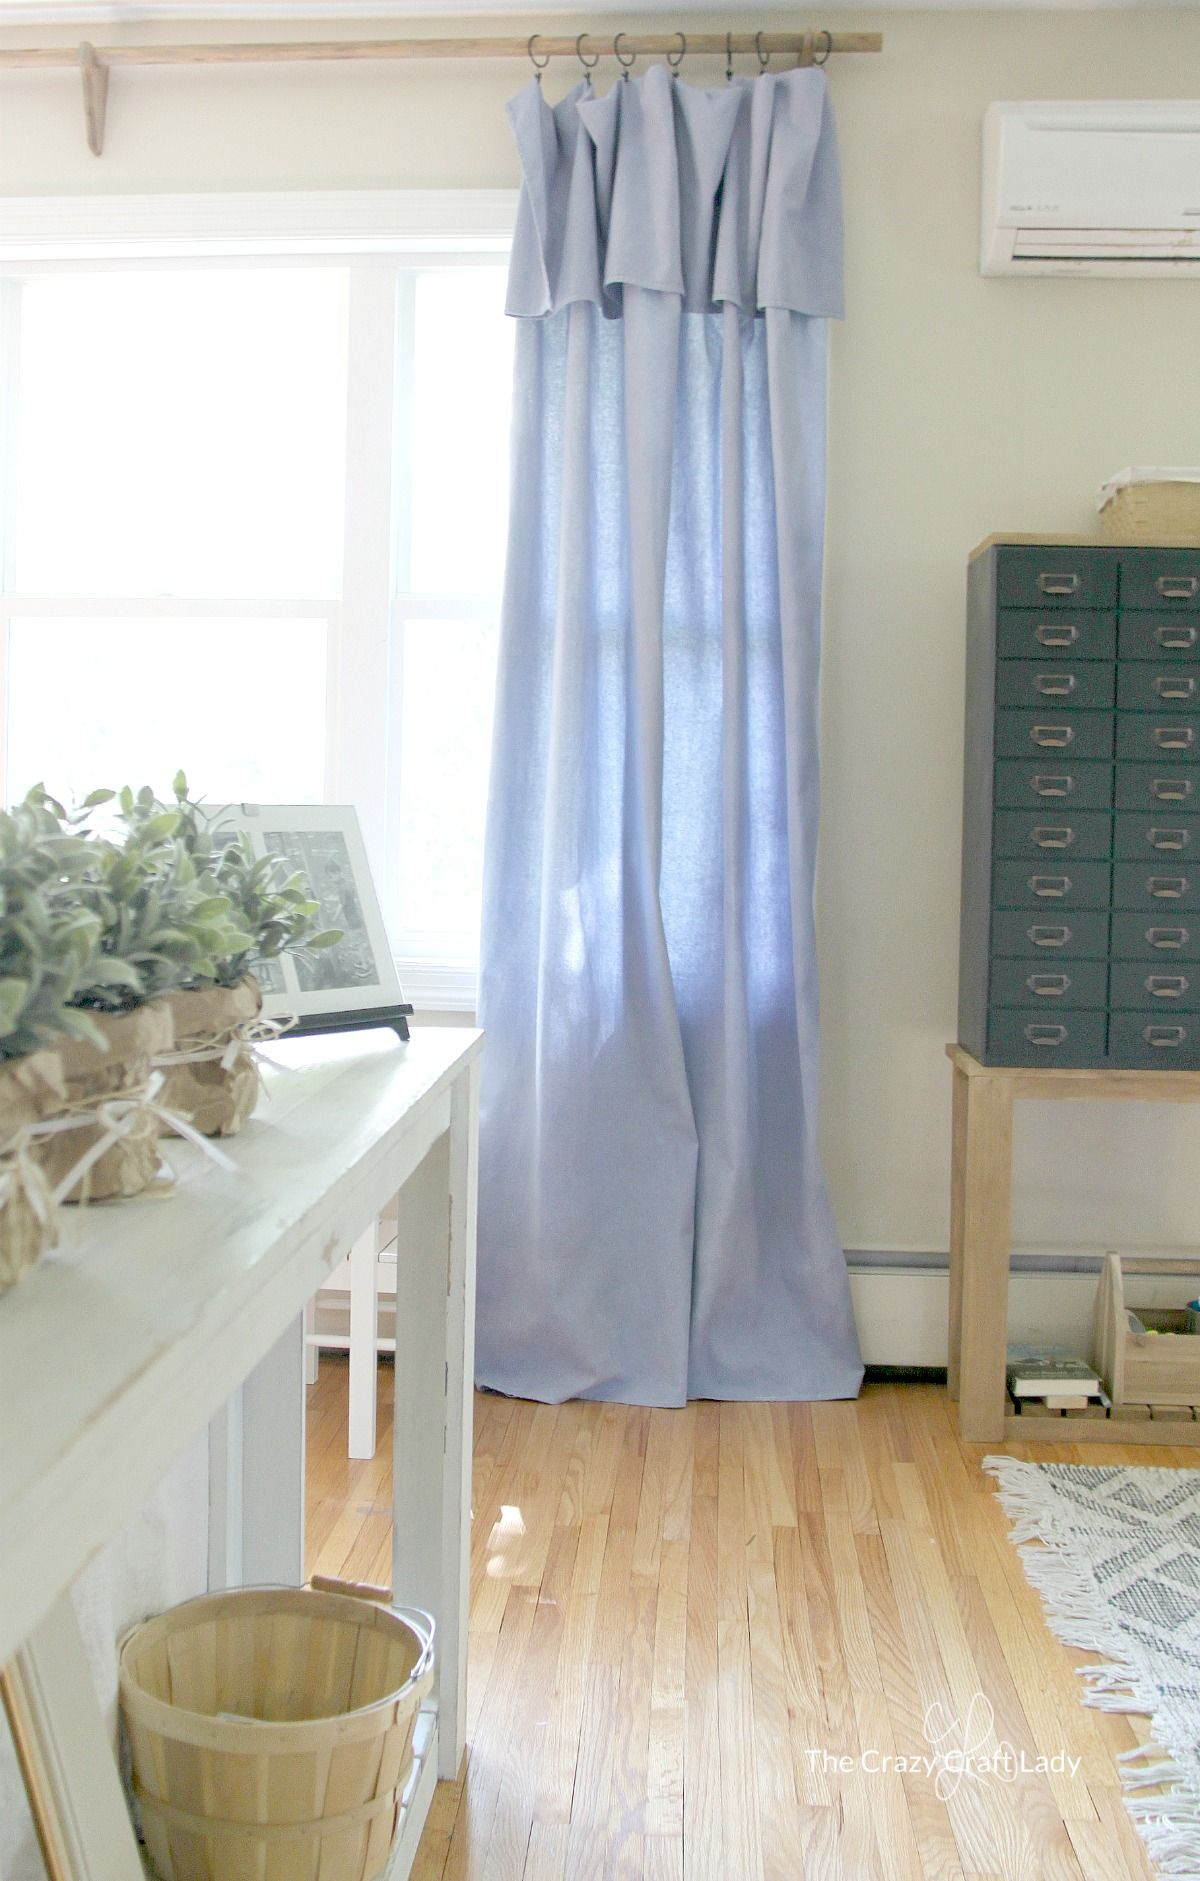 Diy No Sew Drop Cloth Curtains A Cheap Diy Curtain Rod Diy